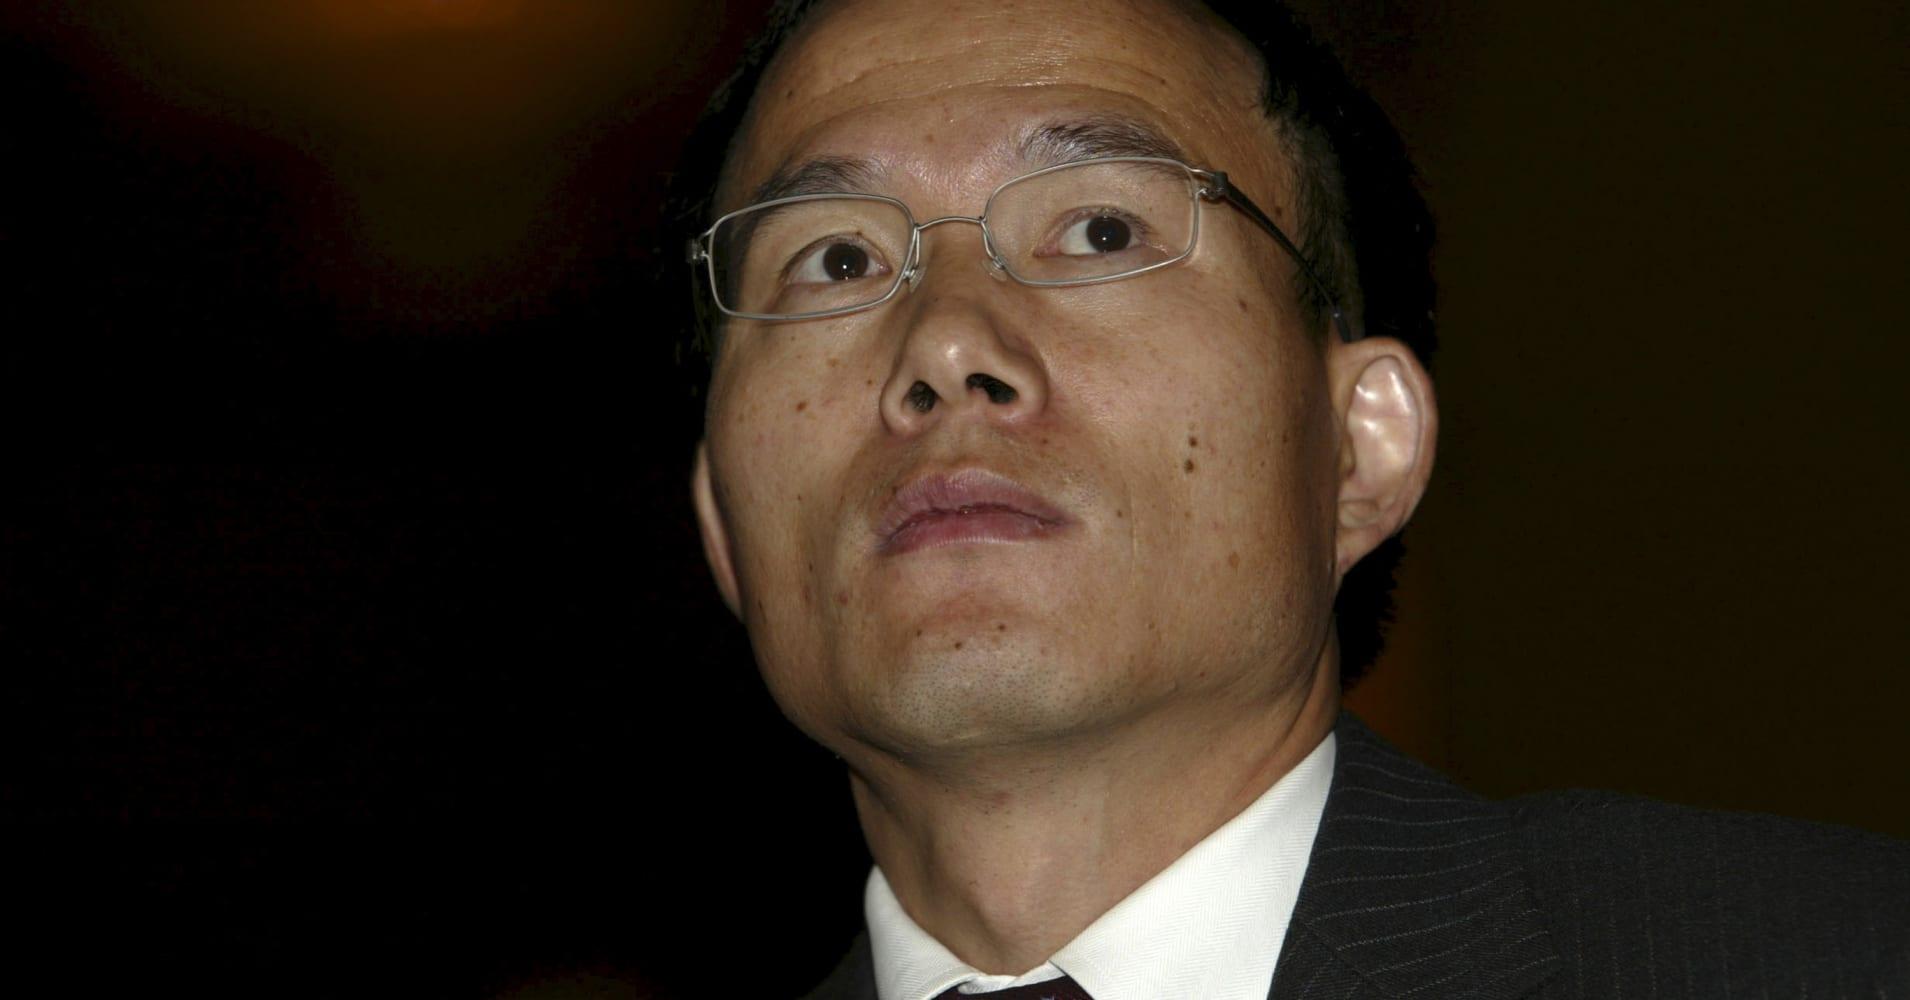 Despite capital controls, China's 'Warren Buffett' says he's pushing ahead with overseas acquisitions